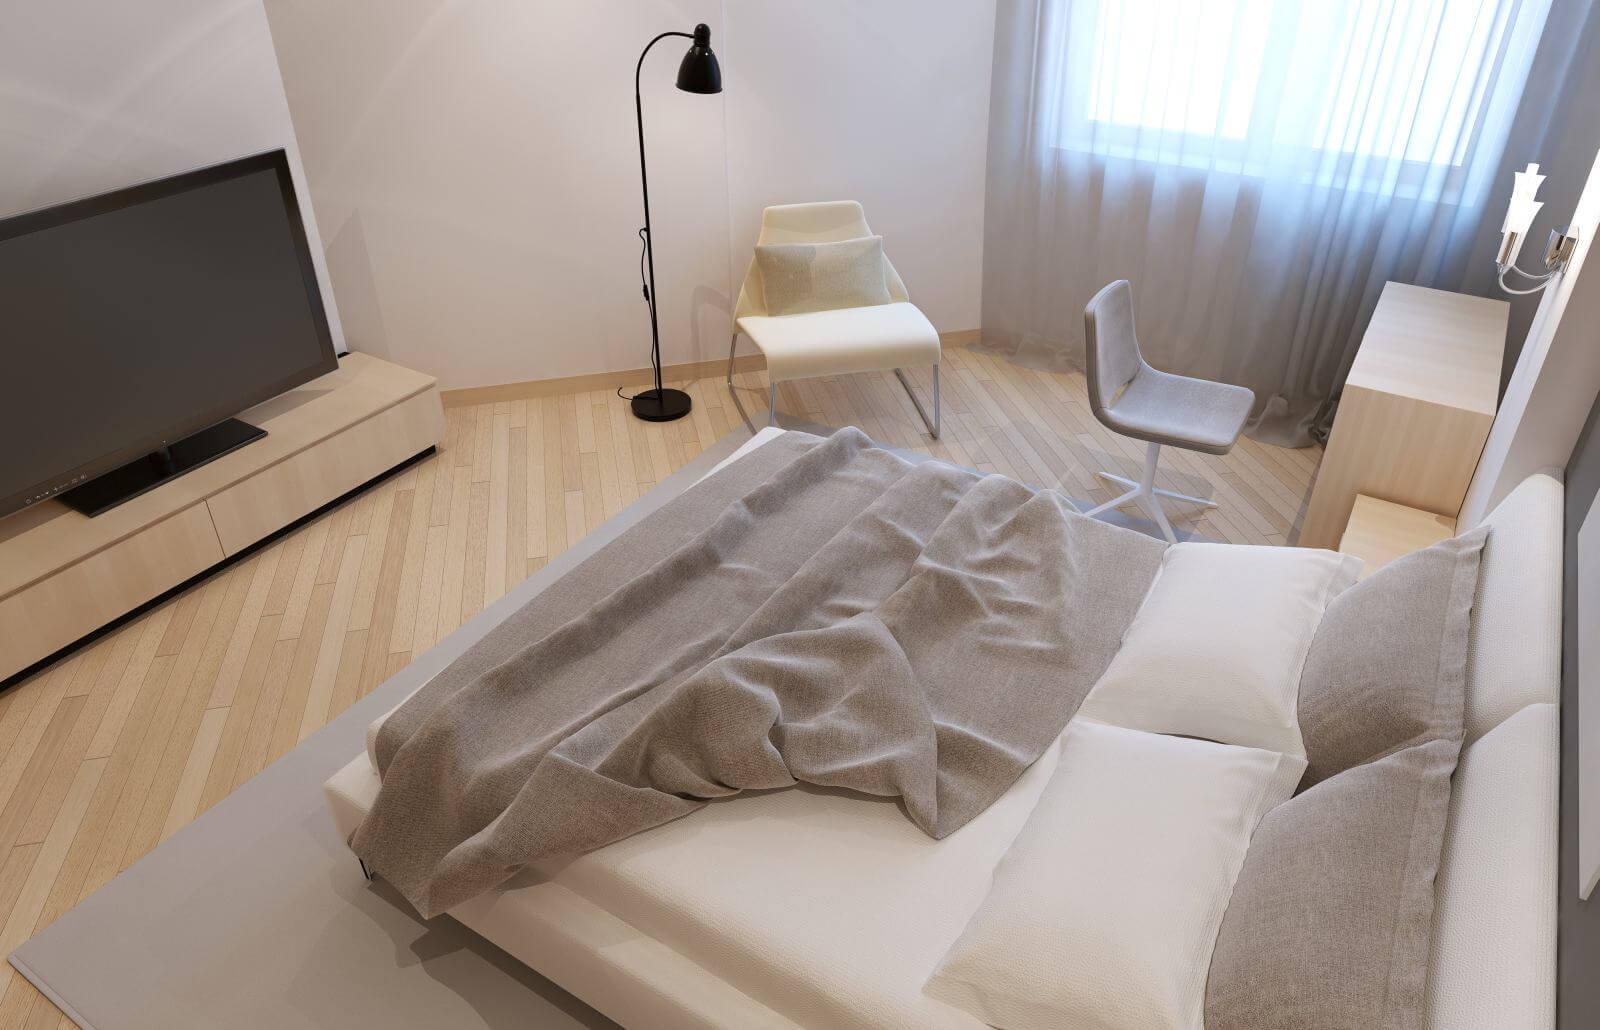 Unmade bed in avangard bedroom with white walls. 3D render